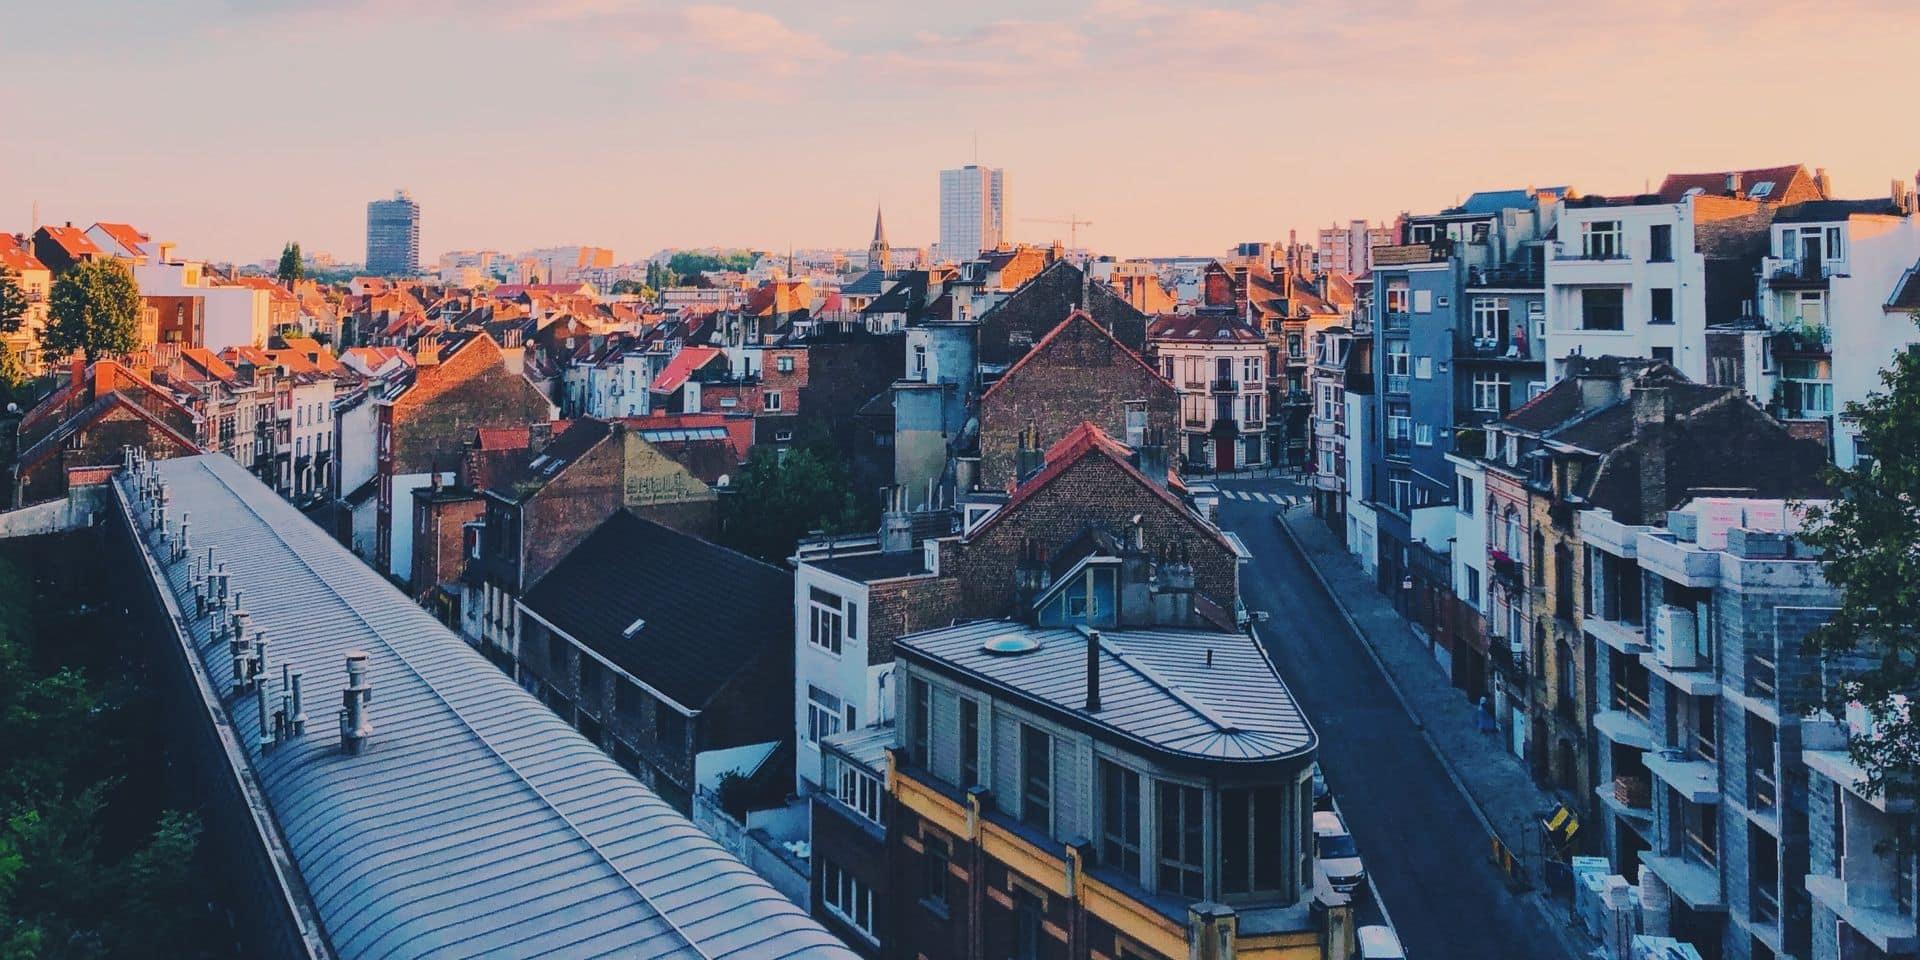 Bruxelles: la carte interactive du prix de l'immobilier, rue par rue